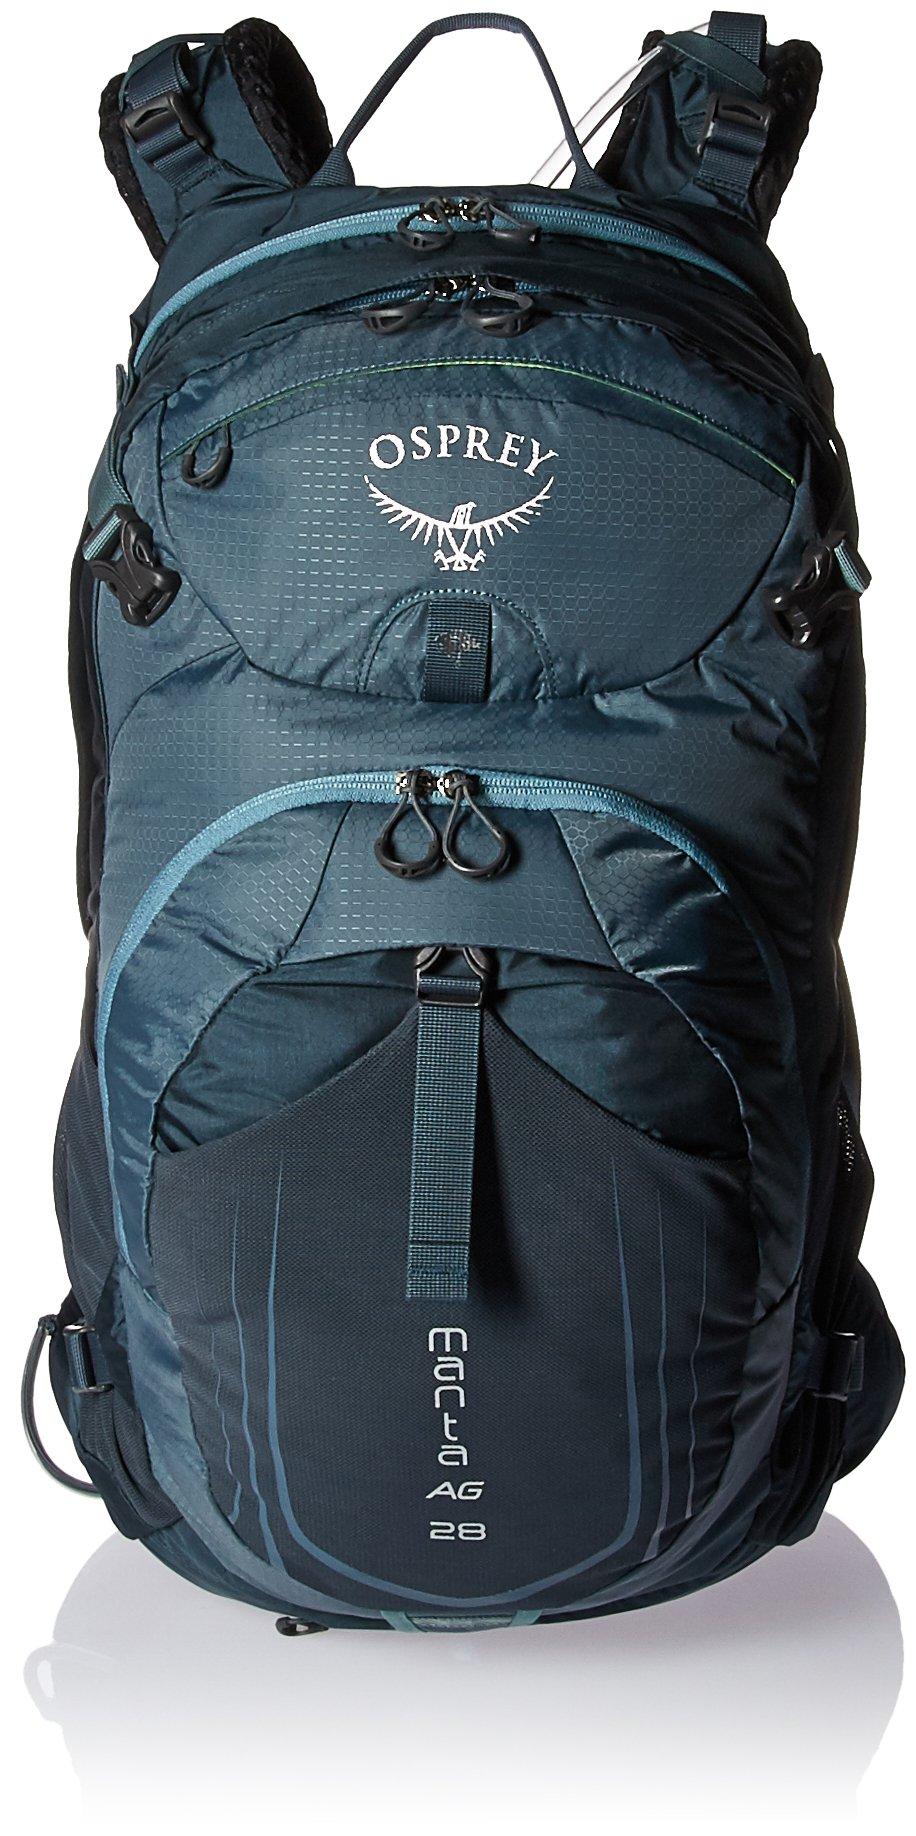 Osprey Packs Manta AG 28 Hydration Pack, Fossil Grey, Medium/Large